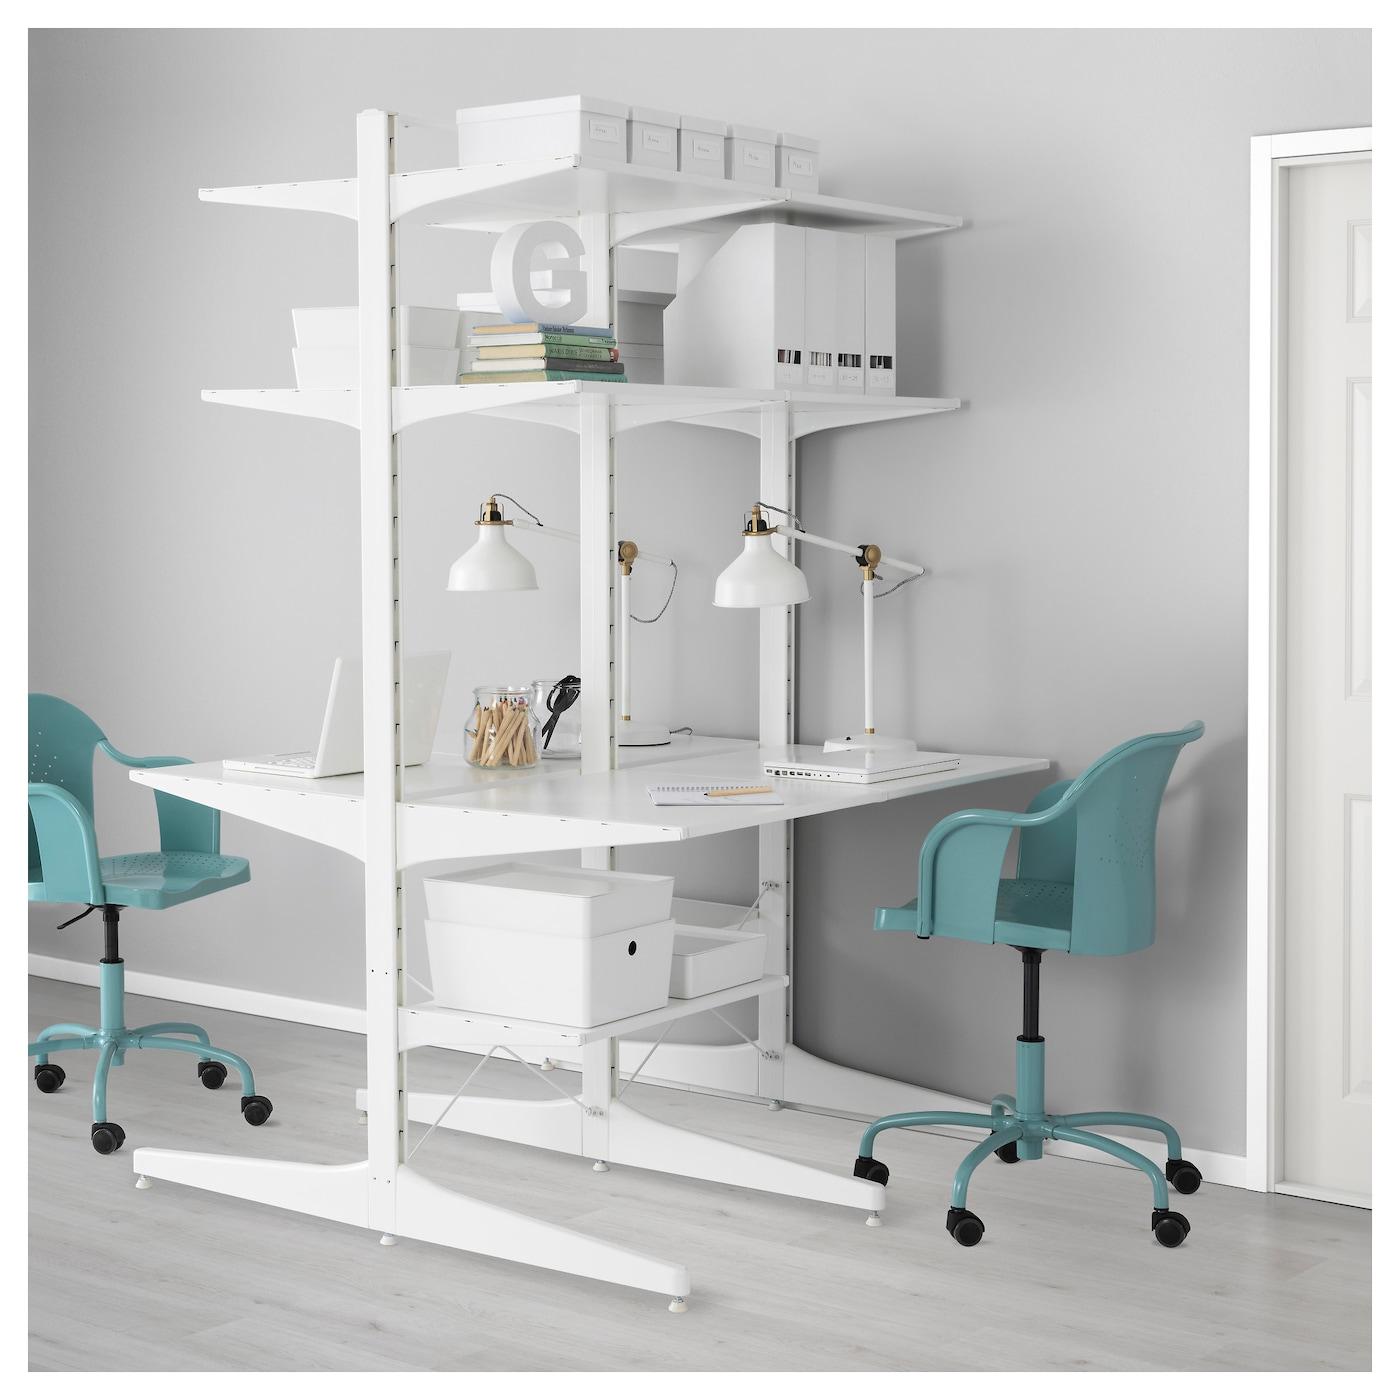 Used Ikea algot foot white 58 cm - ikea